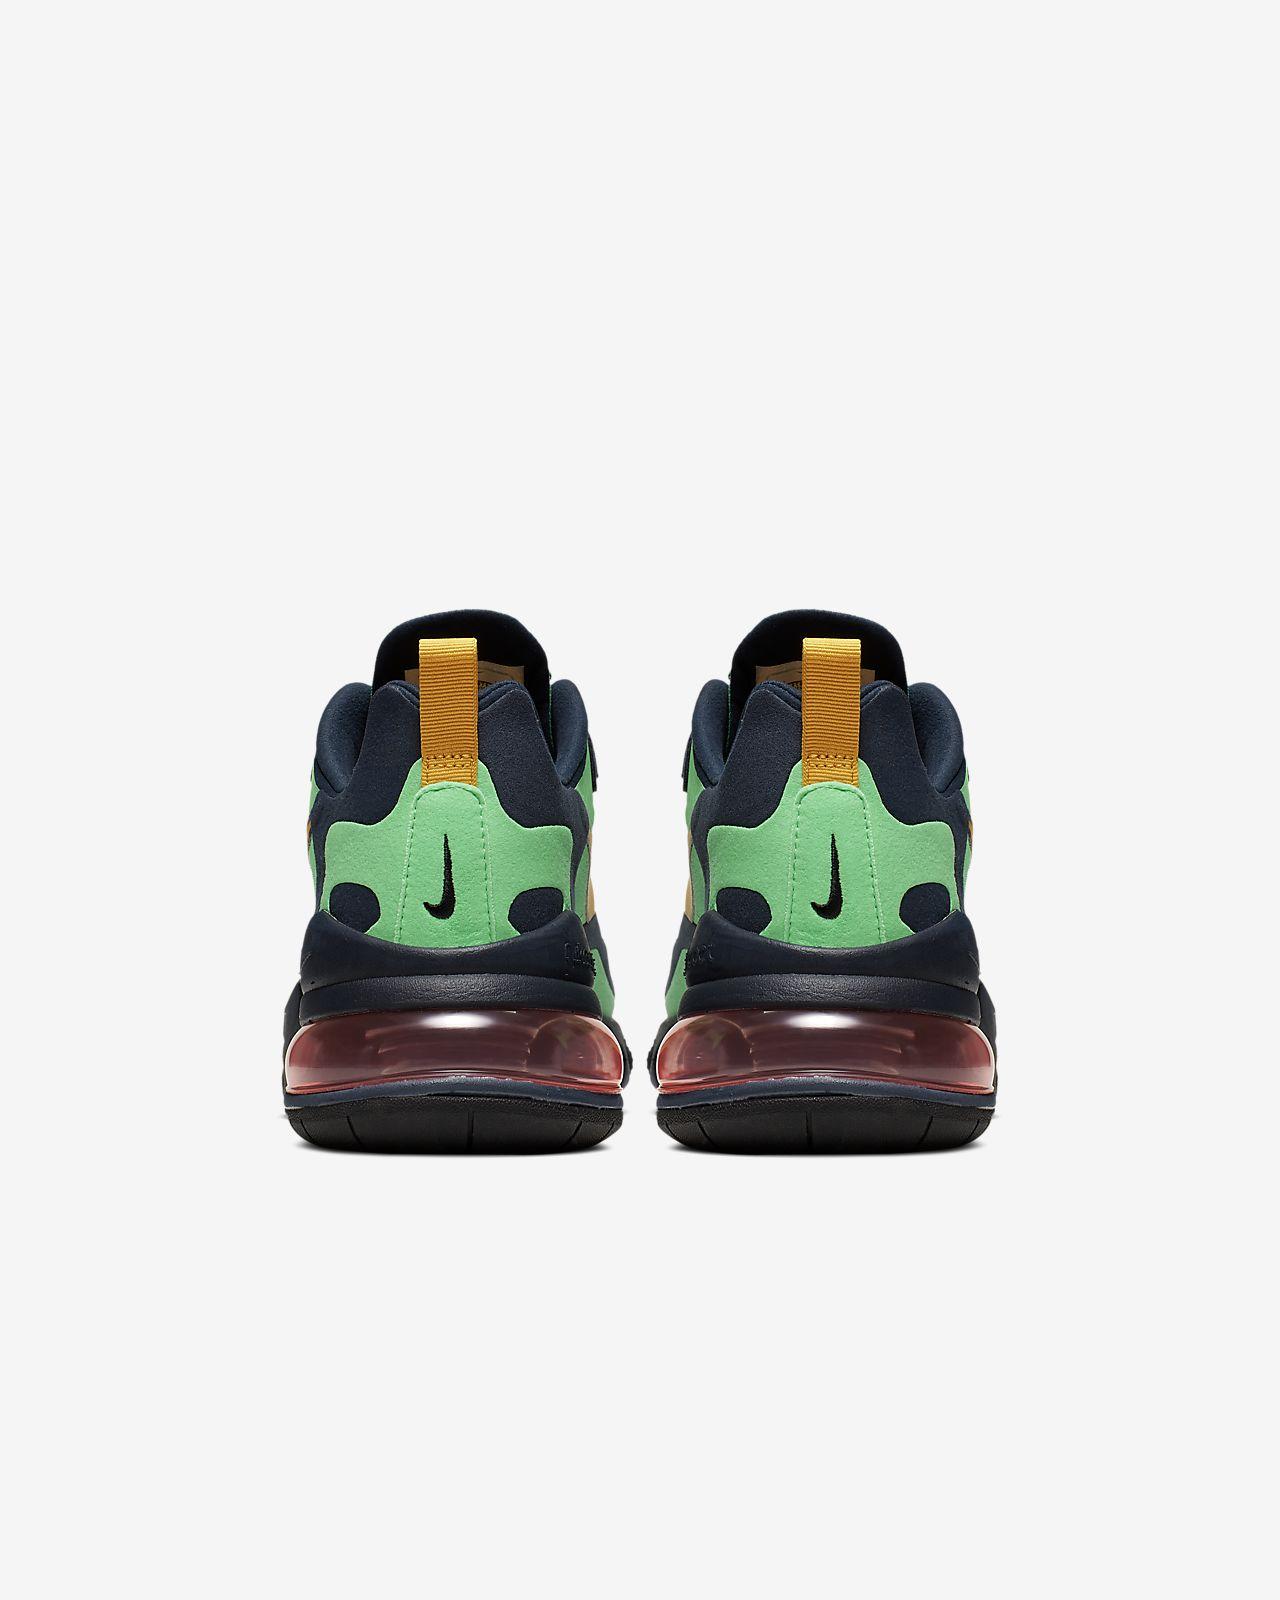 Nike Air Max 270 React (Pop Art) Sneaker